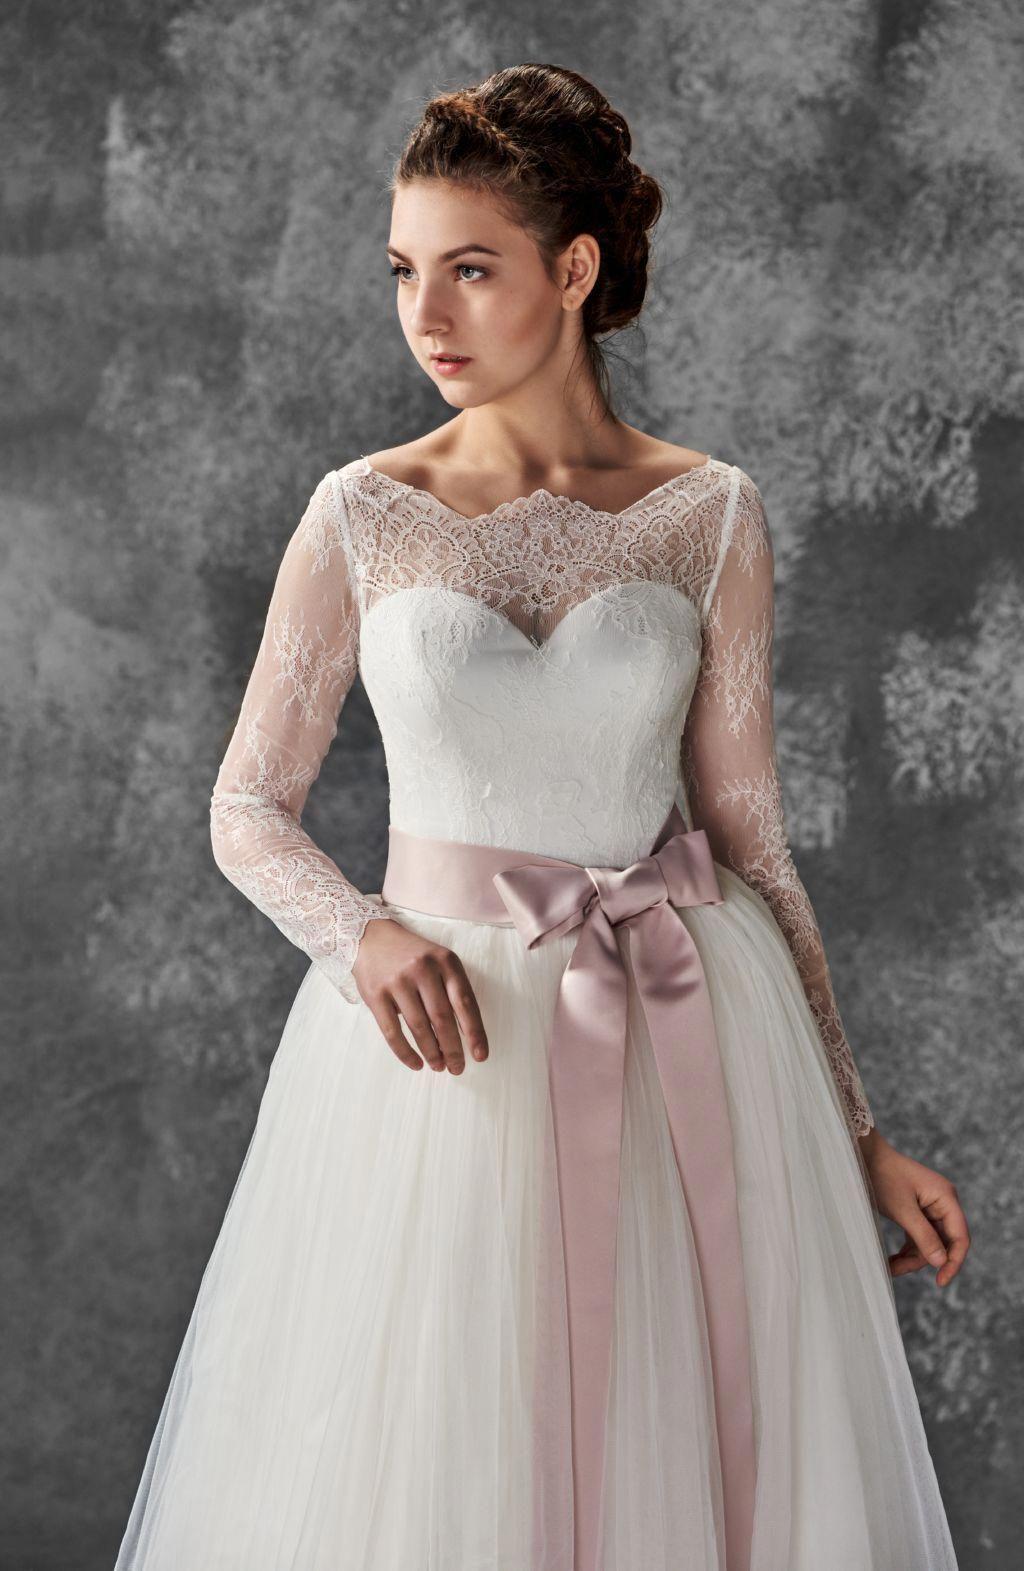 Alia bastamam wedding dress  Wedding lace dress Boho wedding dress Rustic wedding dress by